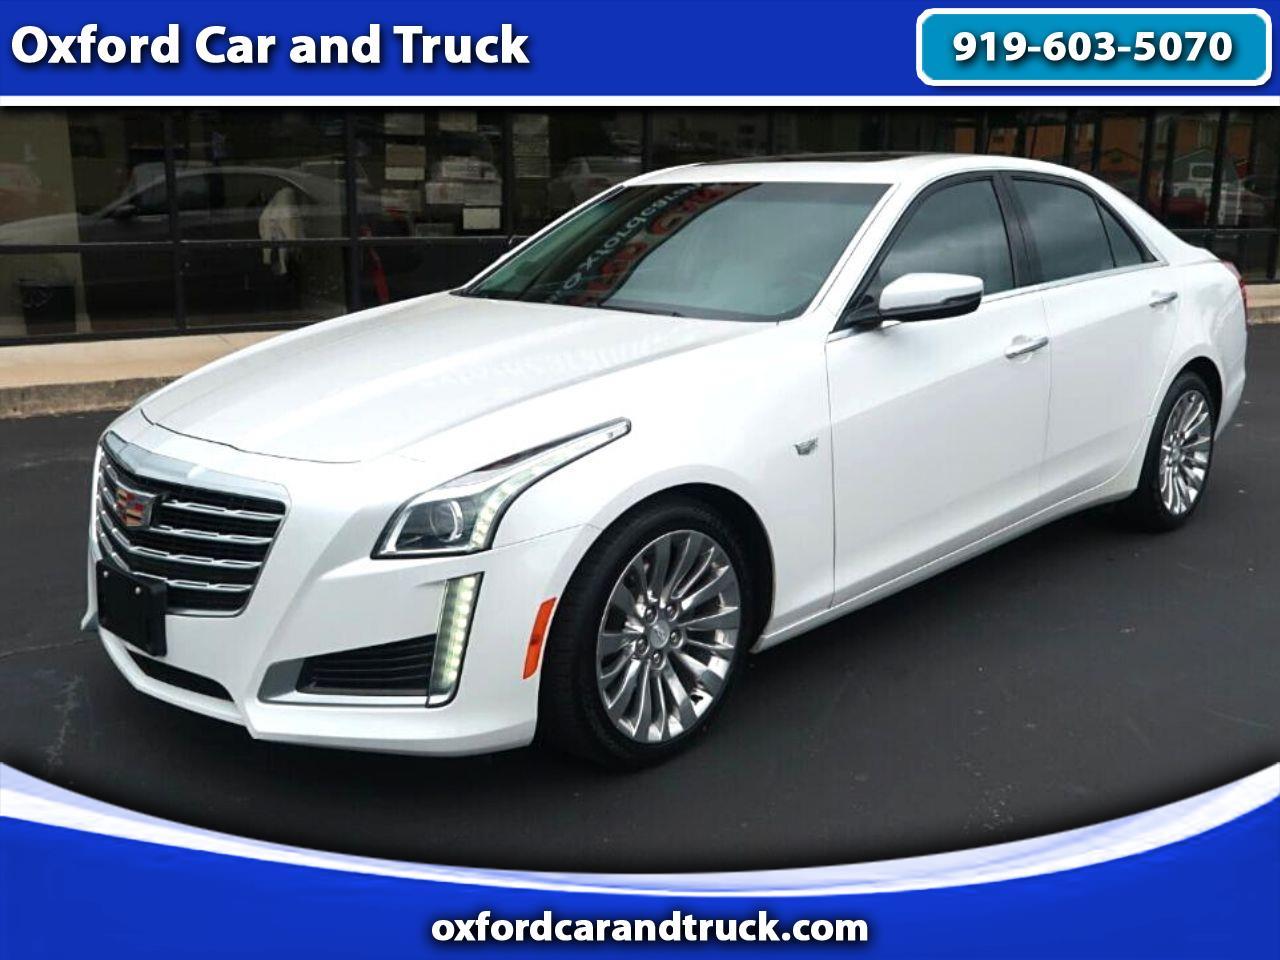 Cadillac CTS Sedan 4dr Sdn 2.0L Turbo Luxury RWD 2017